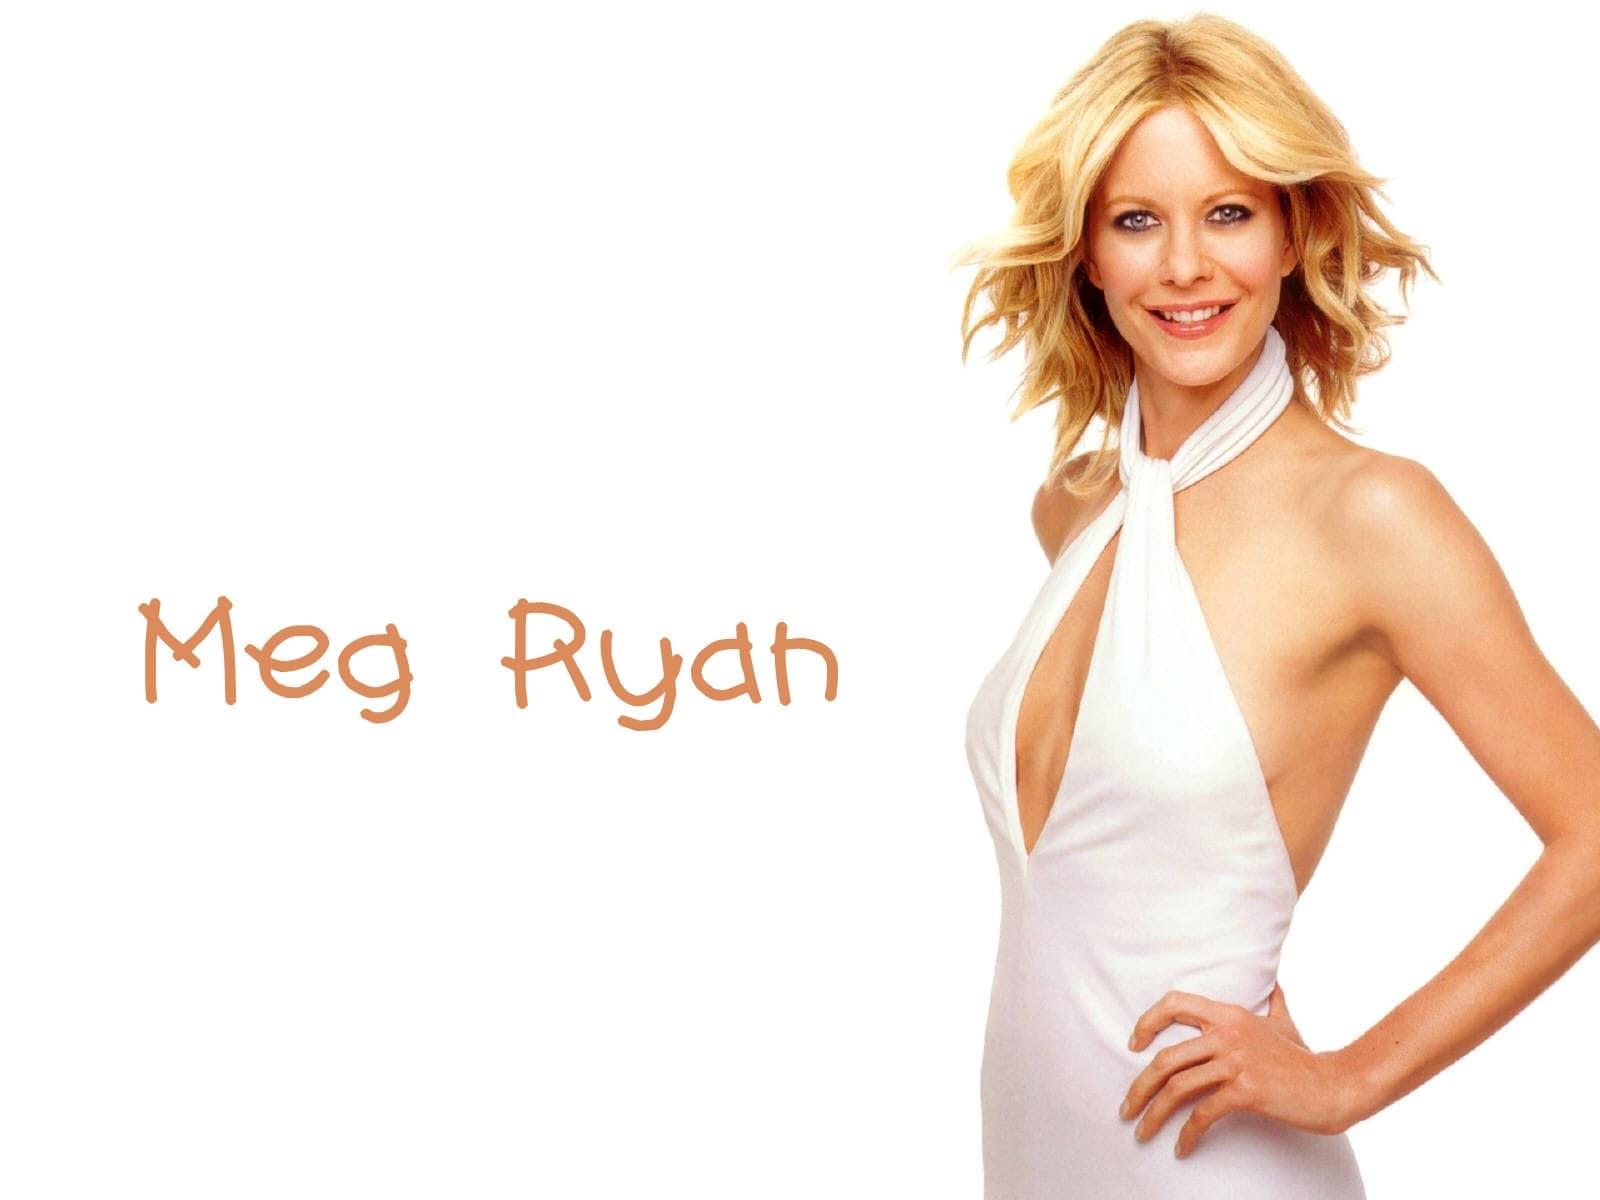 Meg Ryan Widescreen